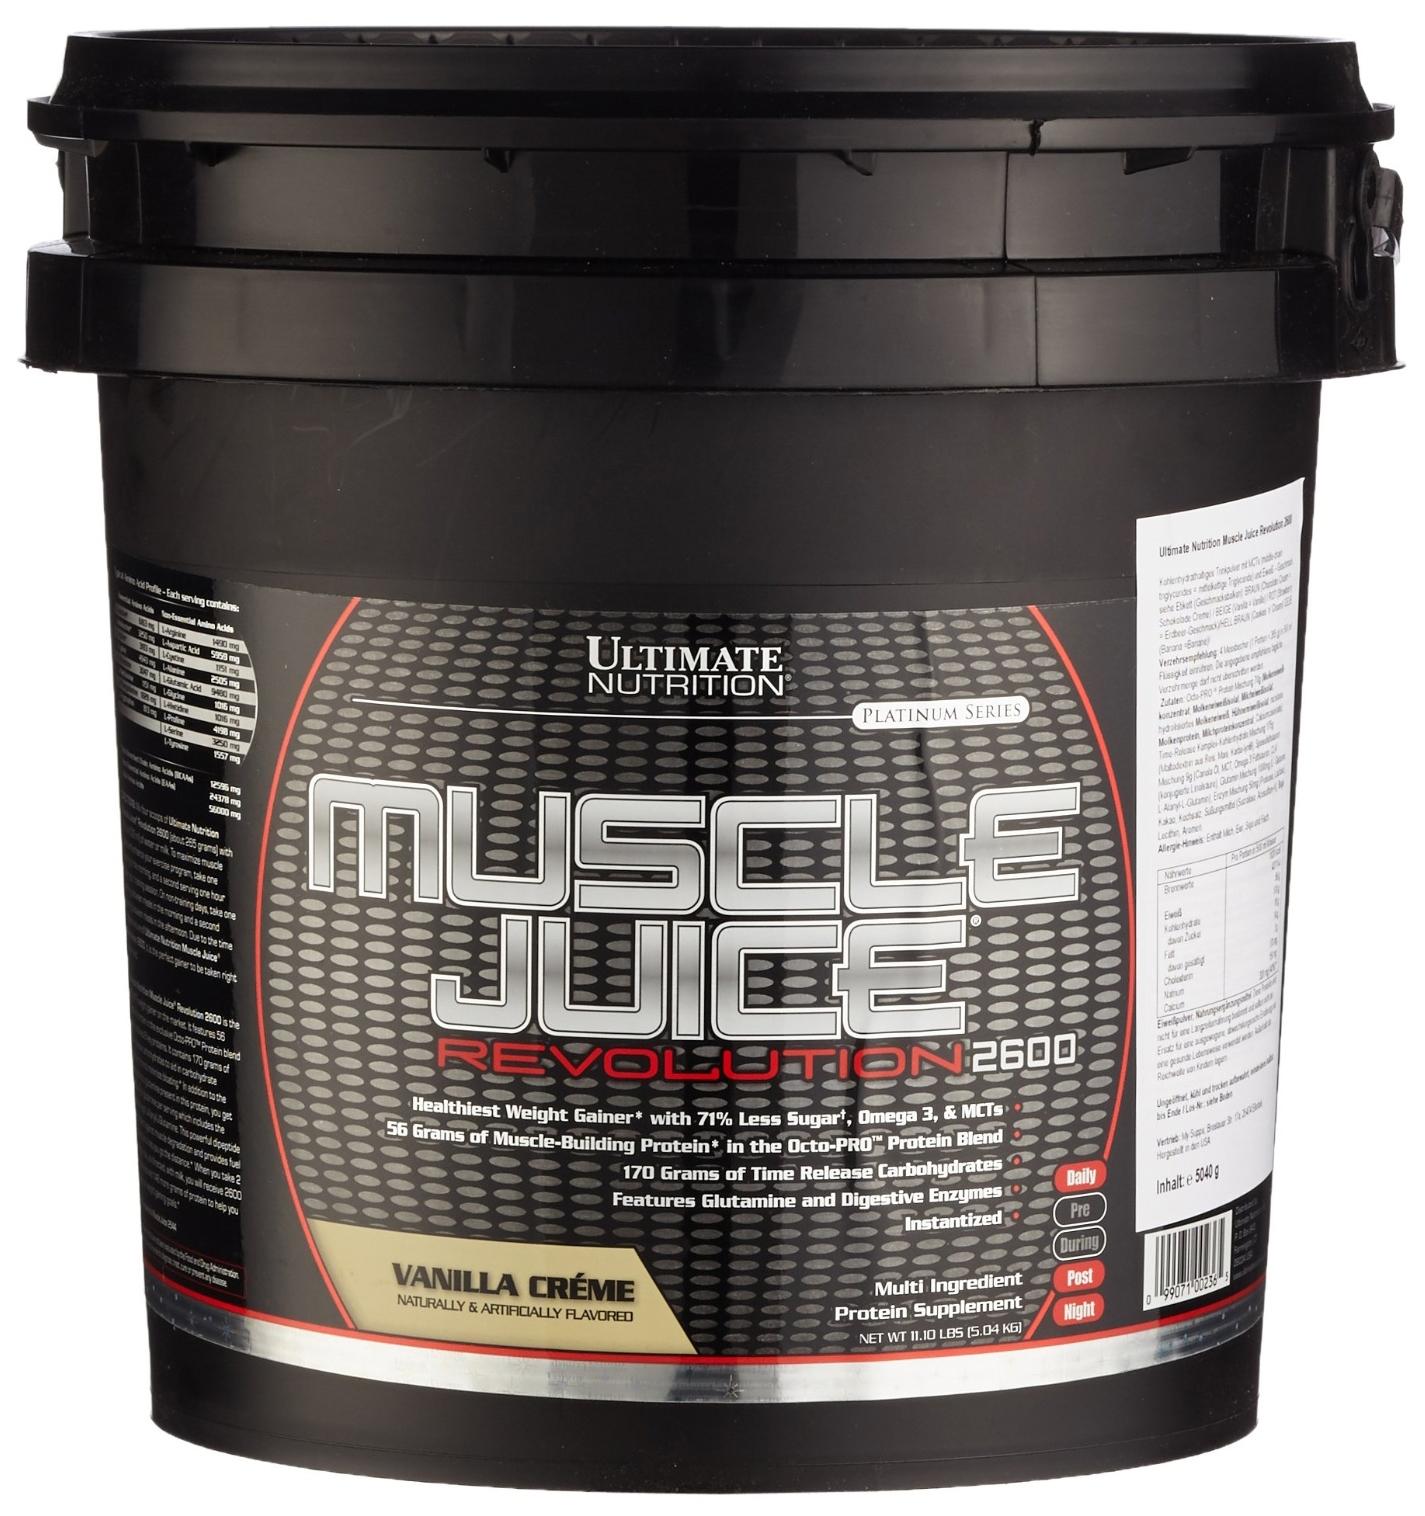 Гейнер Ultimate Nutrition Muscle Juice Revolution 5000 г Chocolate